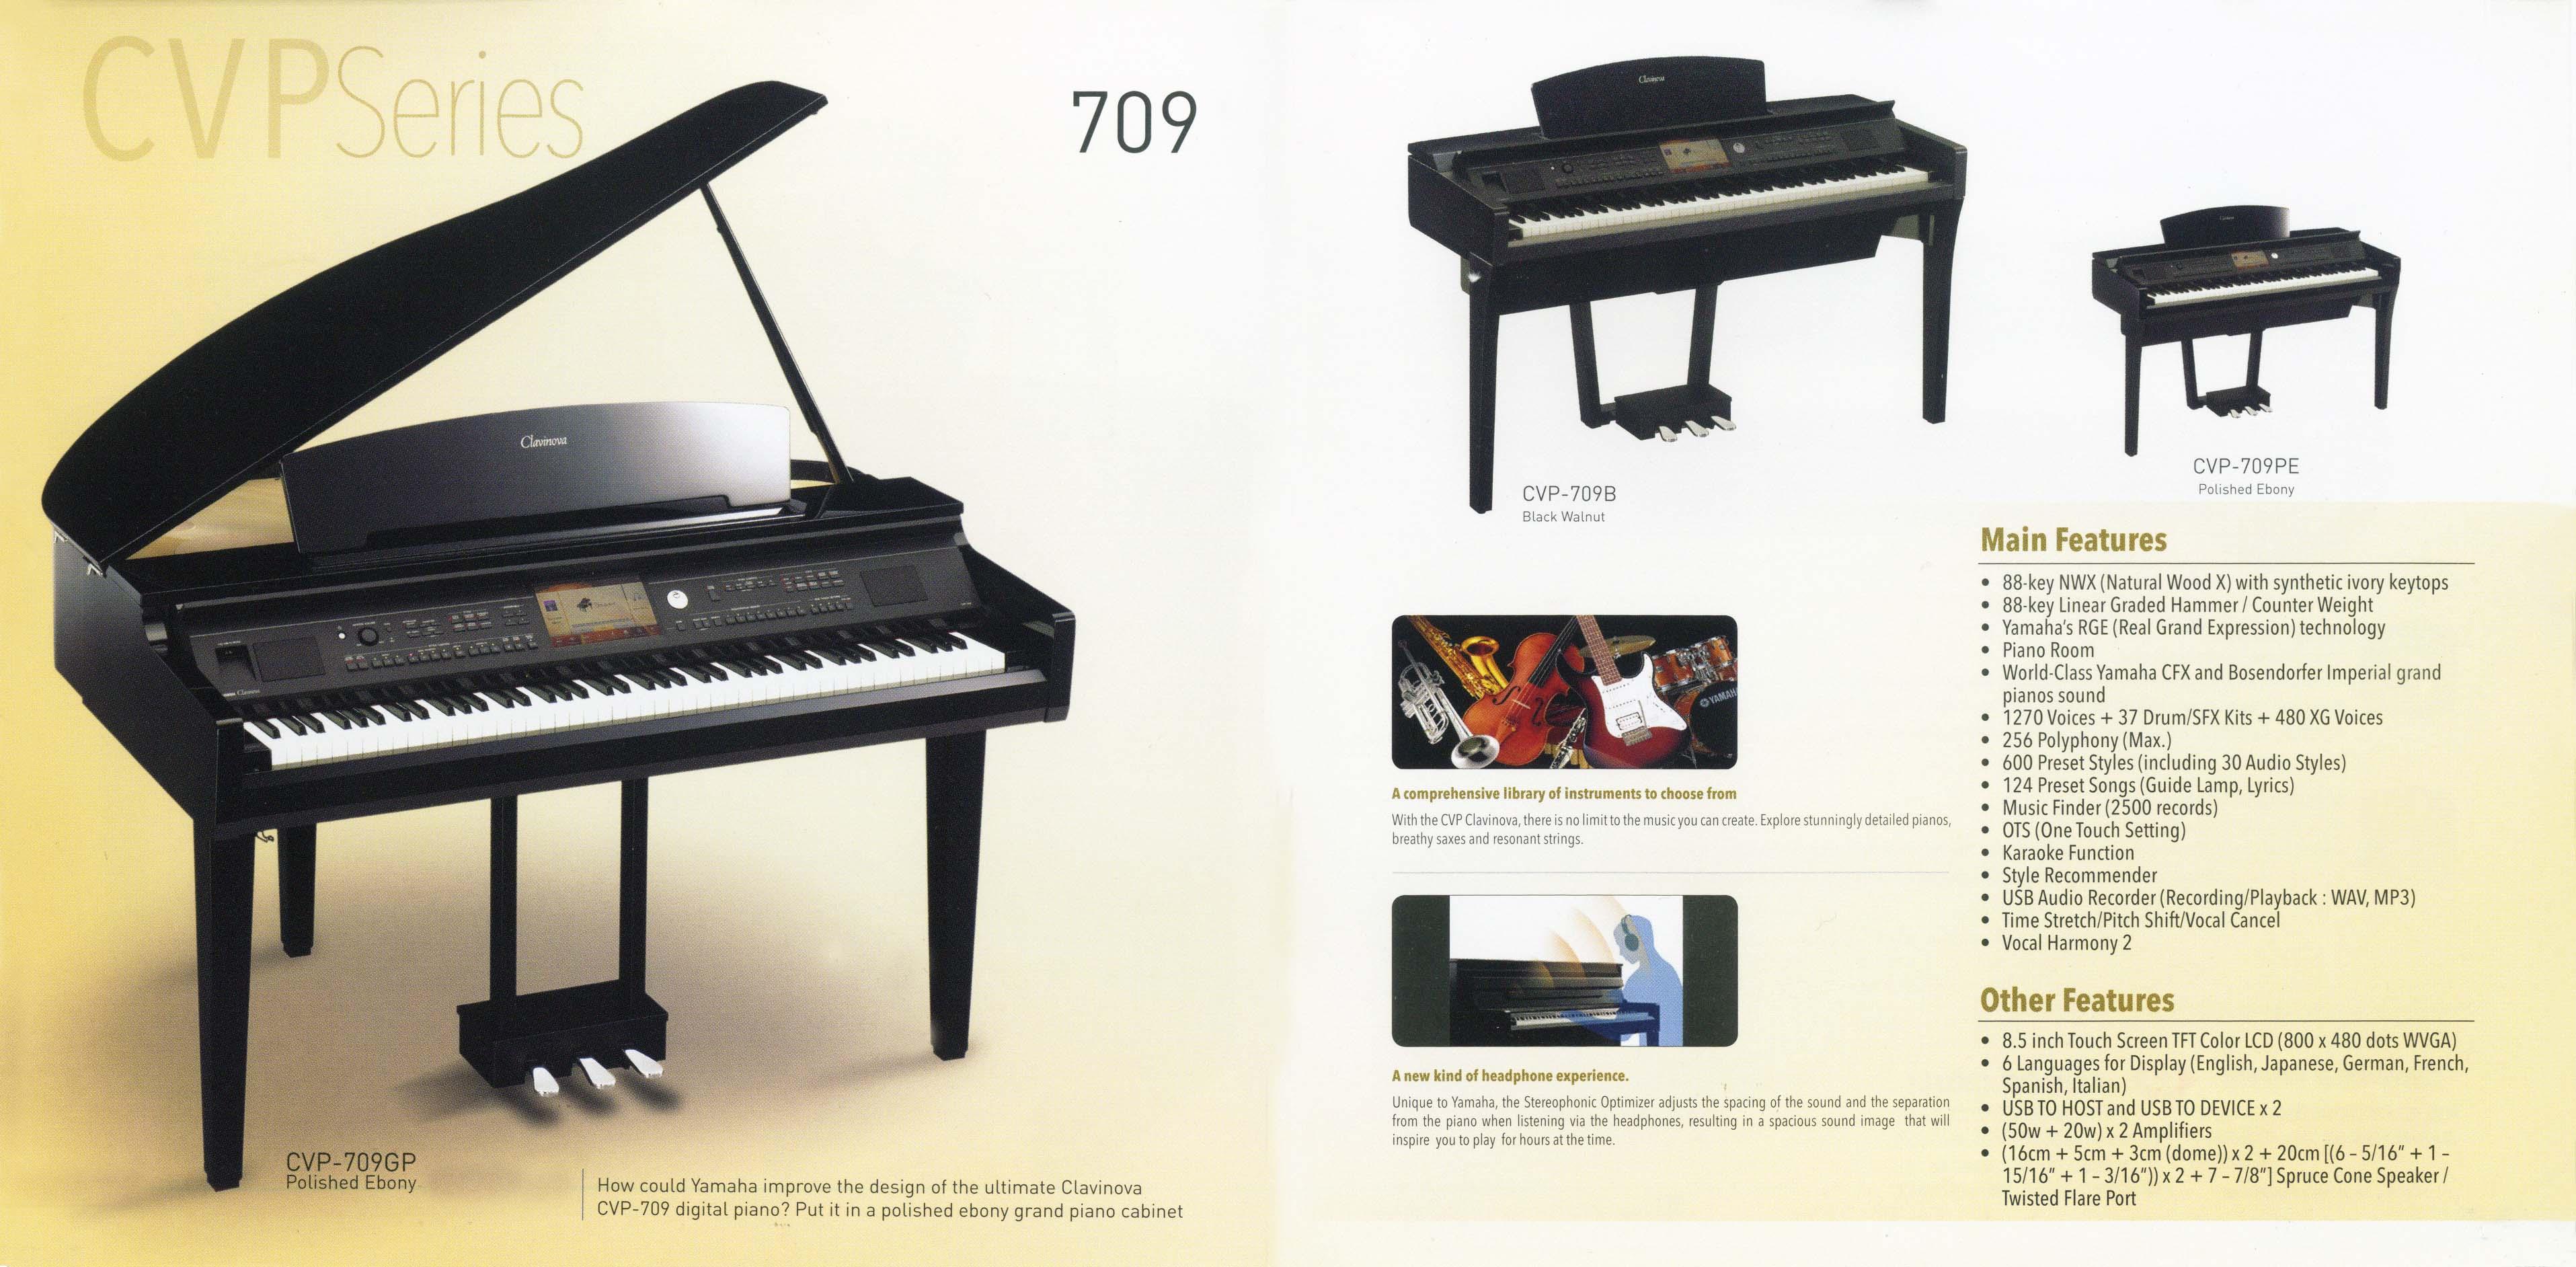 clavinova cvp 709. Black Bedroom Furniture Sets. Home Design Ideas